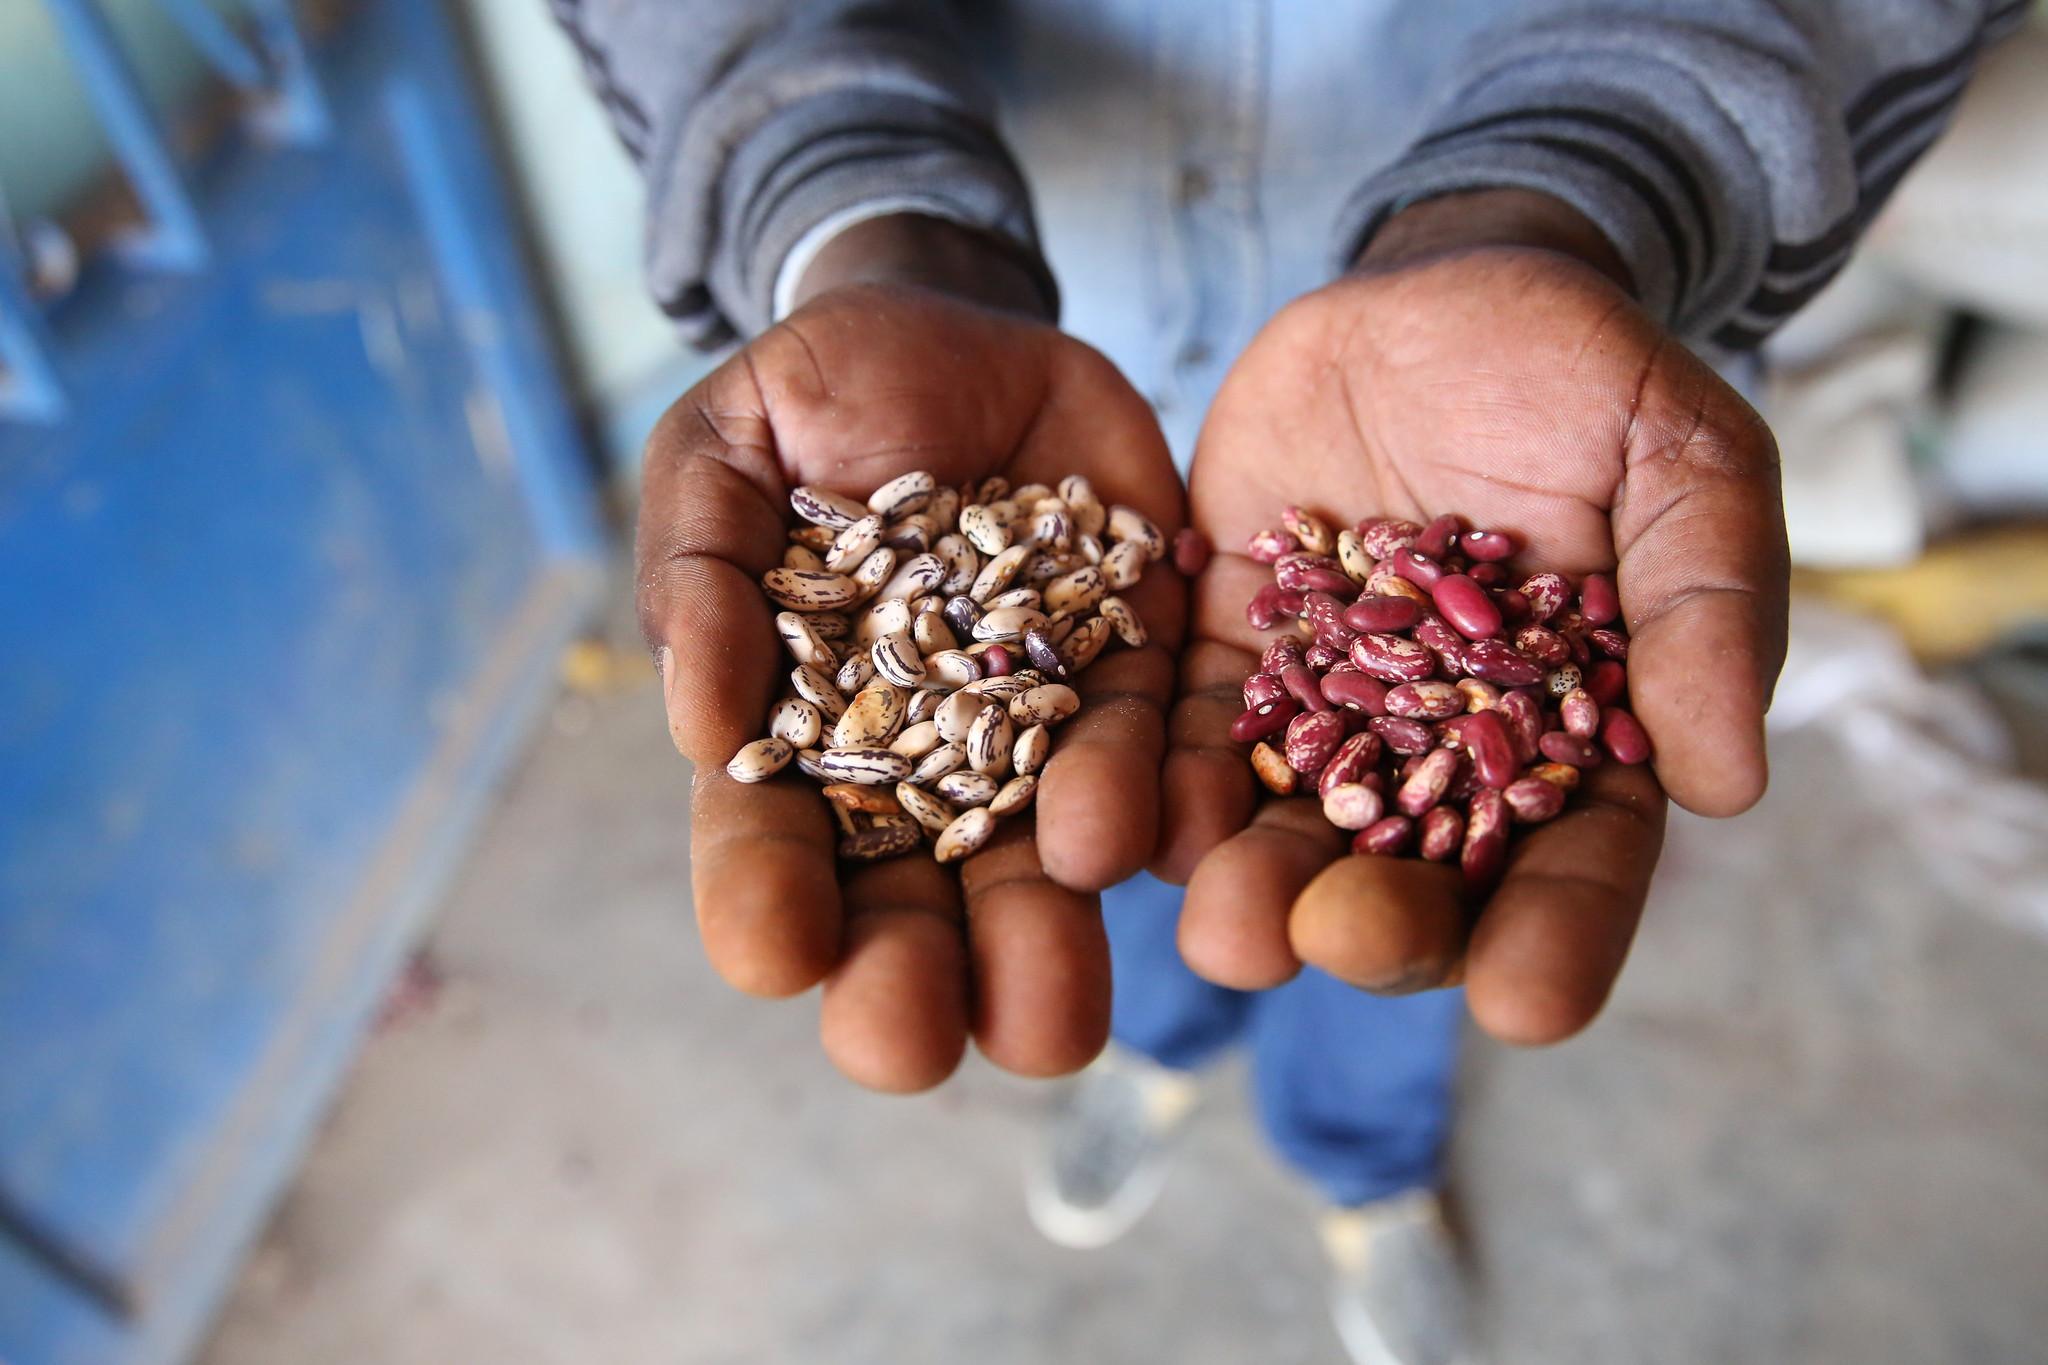 Beans diversity in Kenya, photo by Neil Palmer